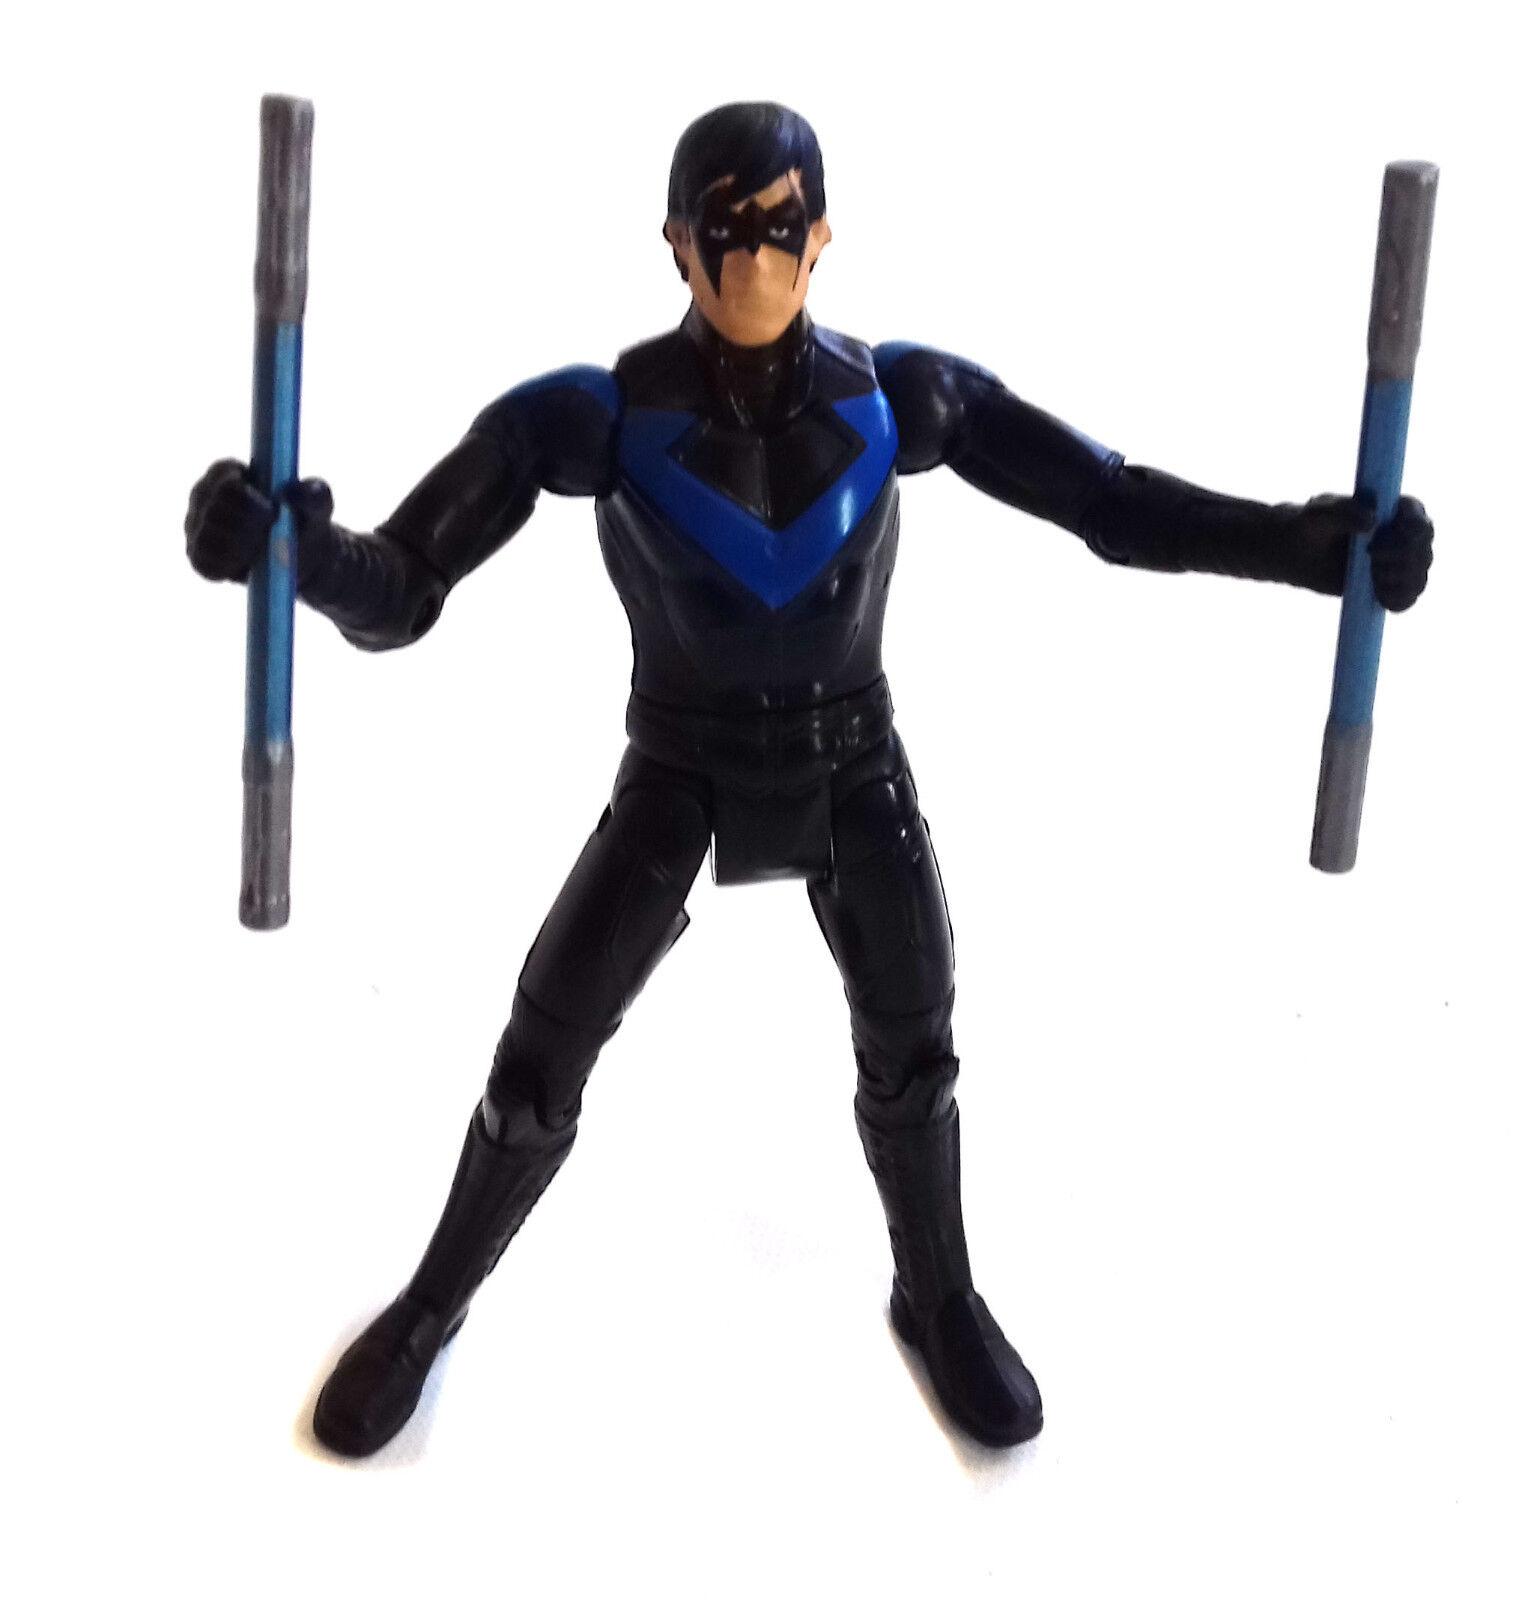 Dc comics batman - universum multiversum nightwing spielzeug robin 3,75